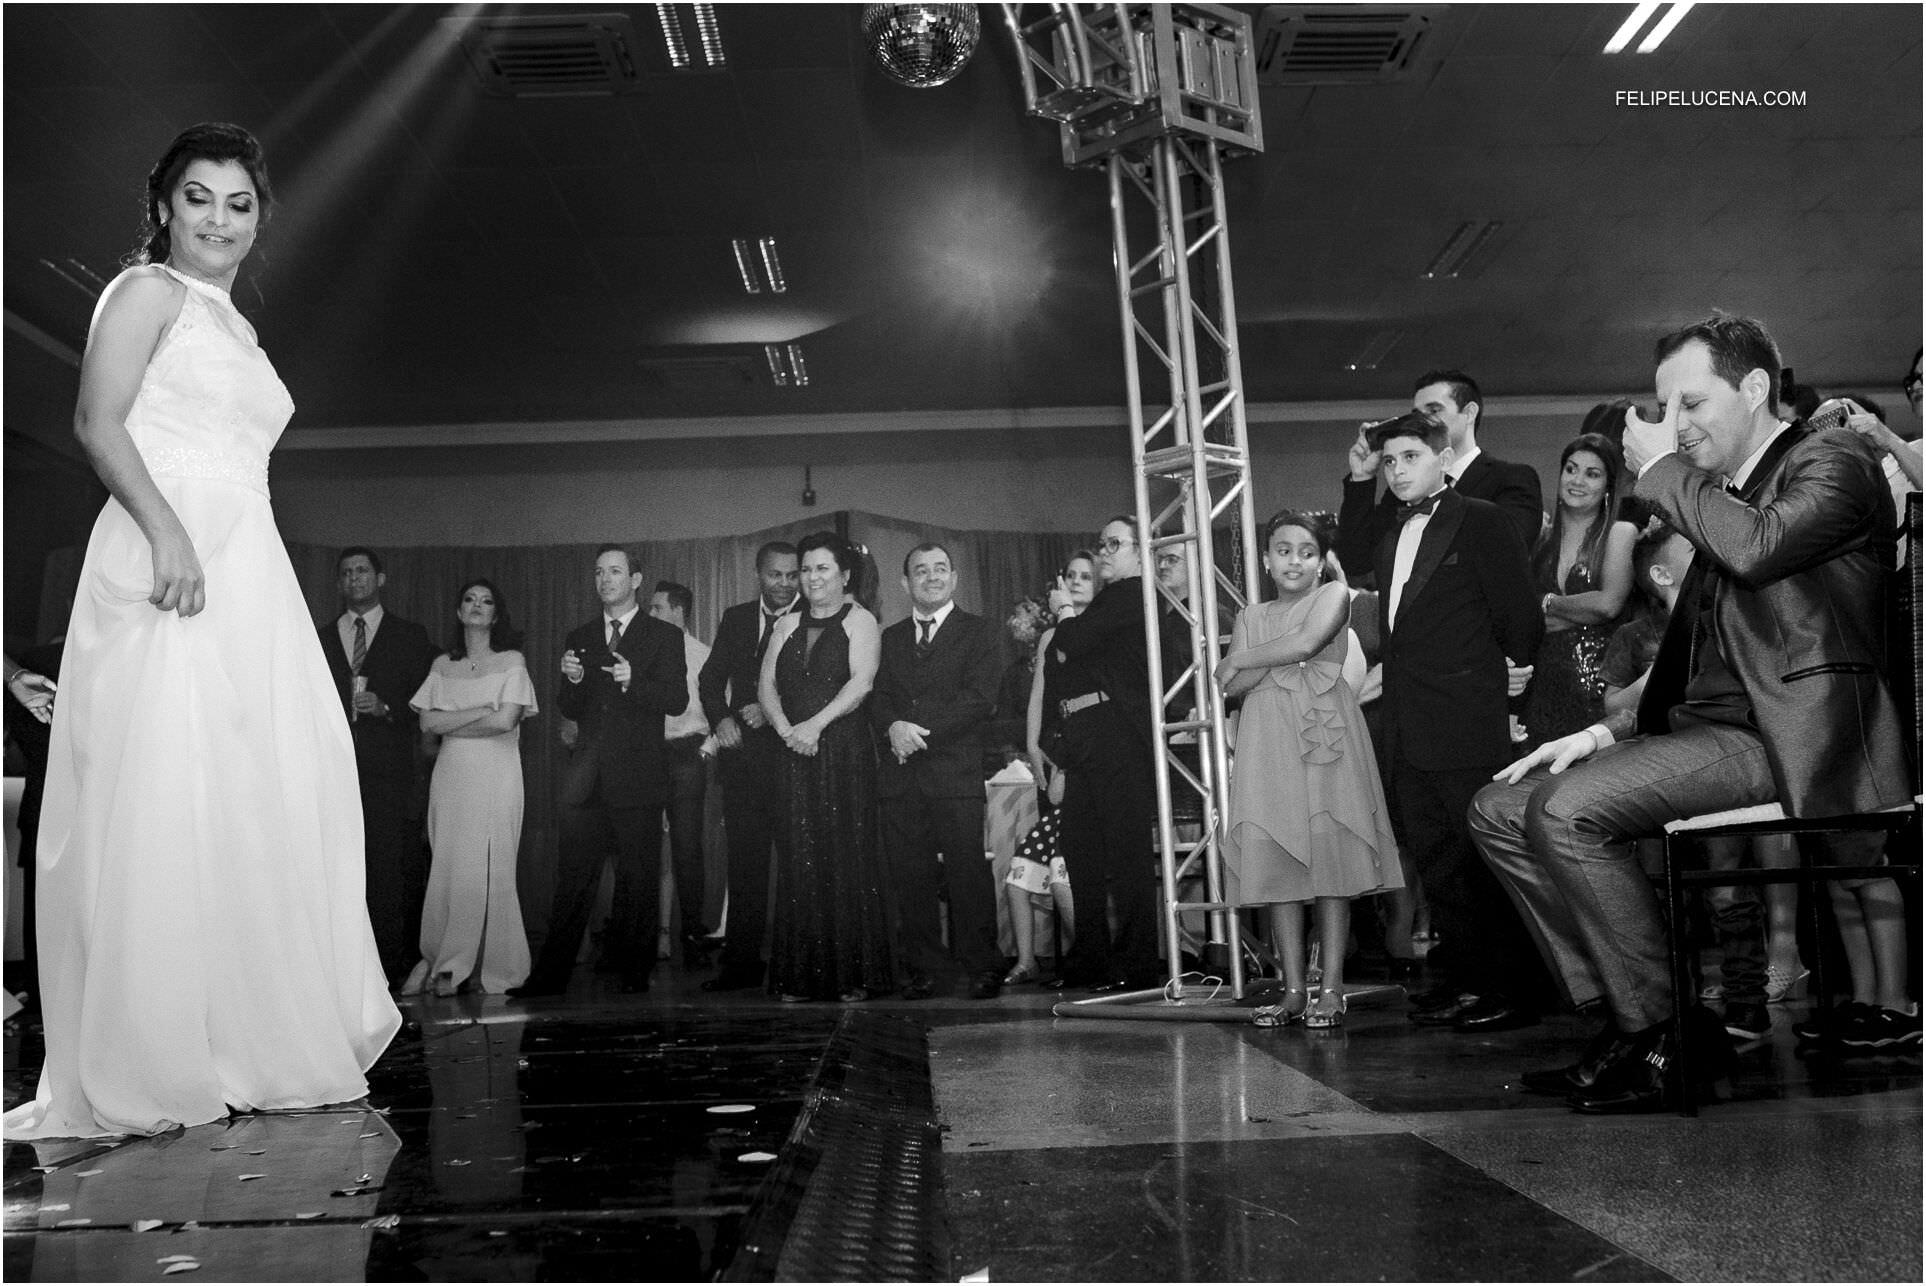 danca do casal